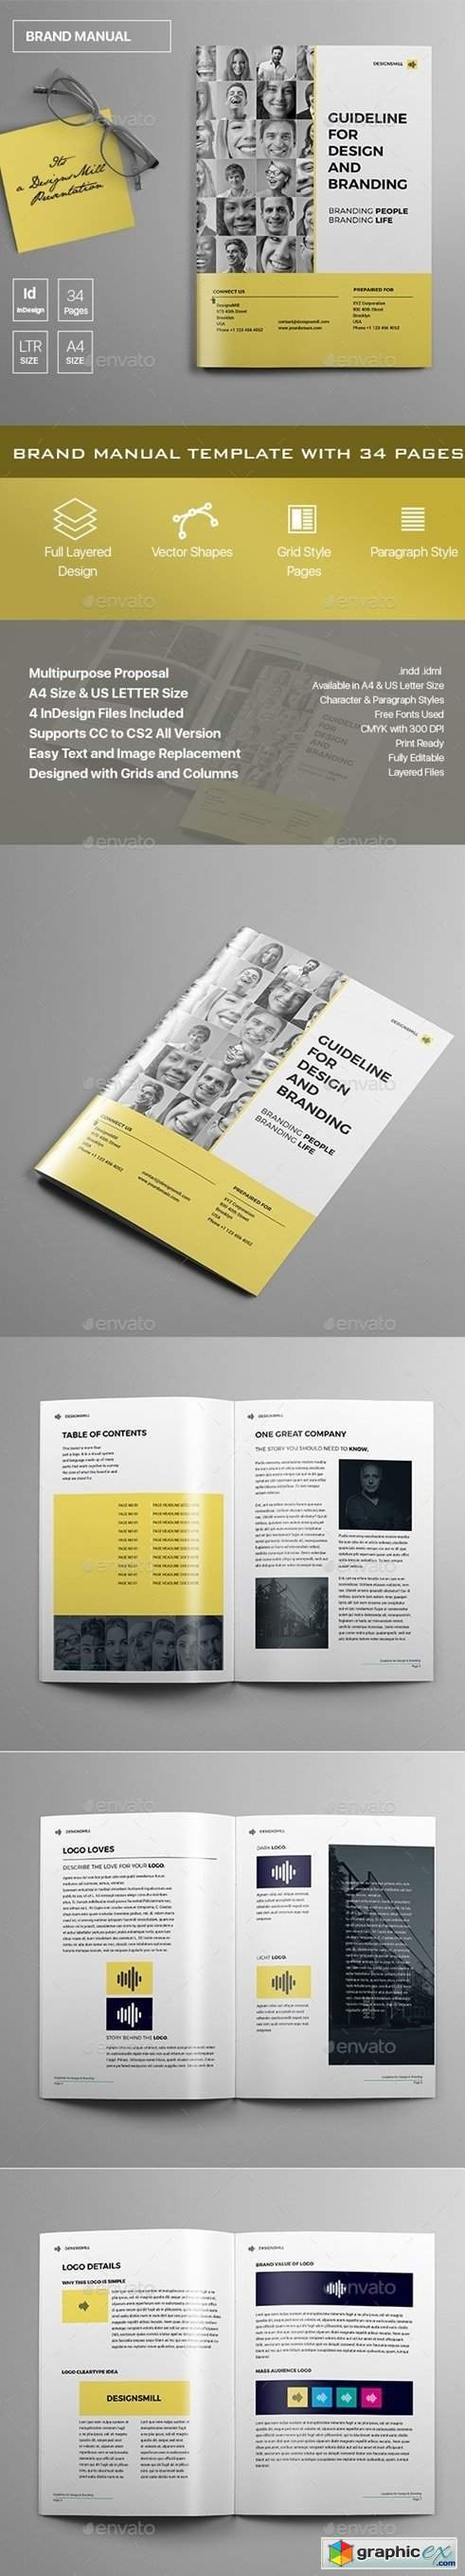 Brand Manual 19909855